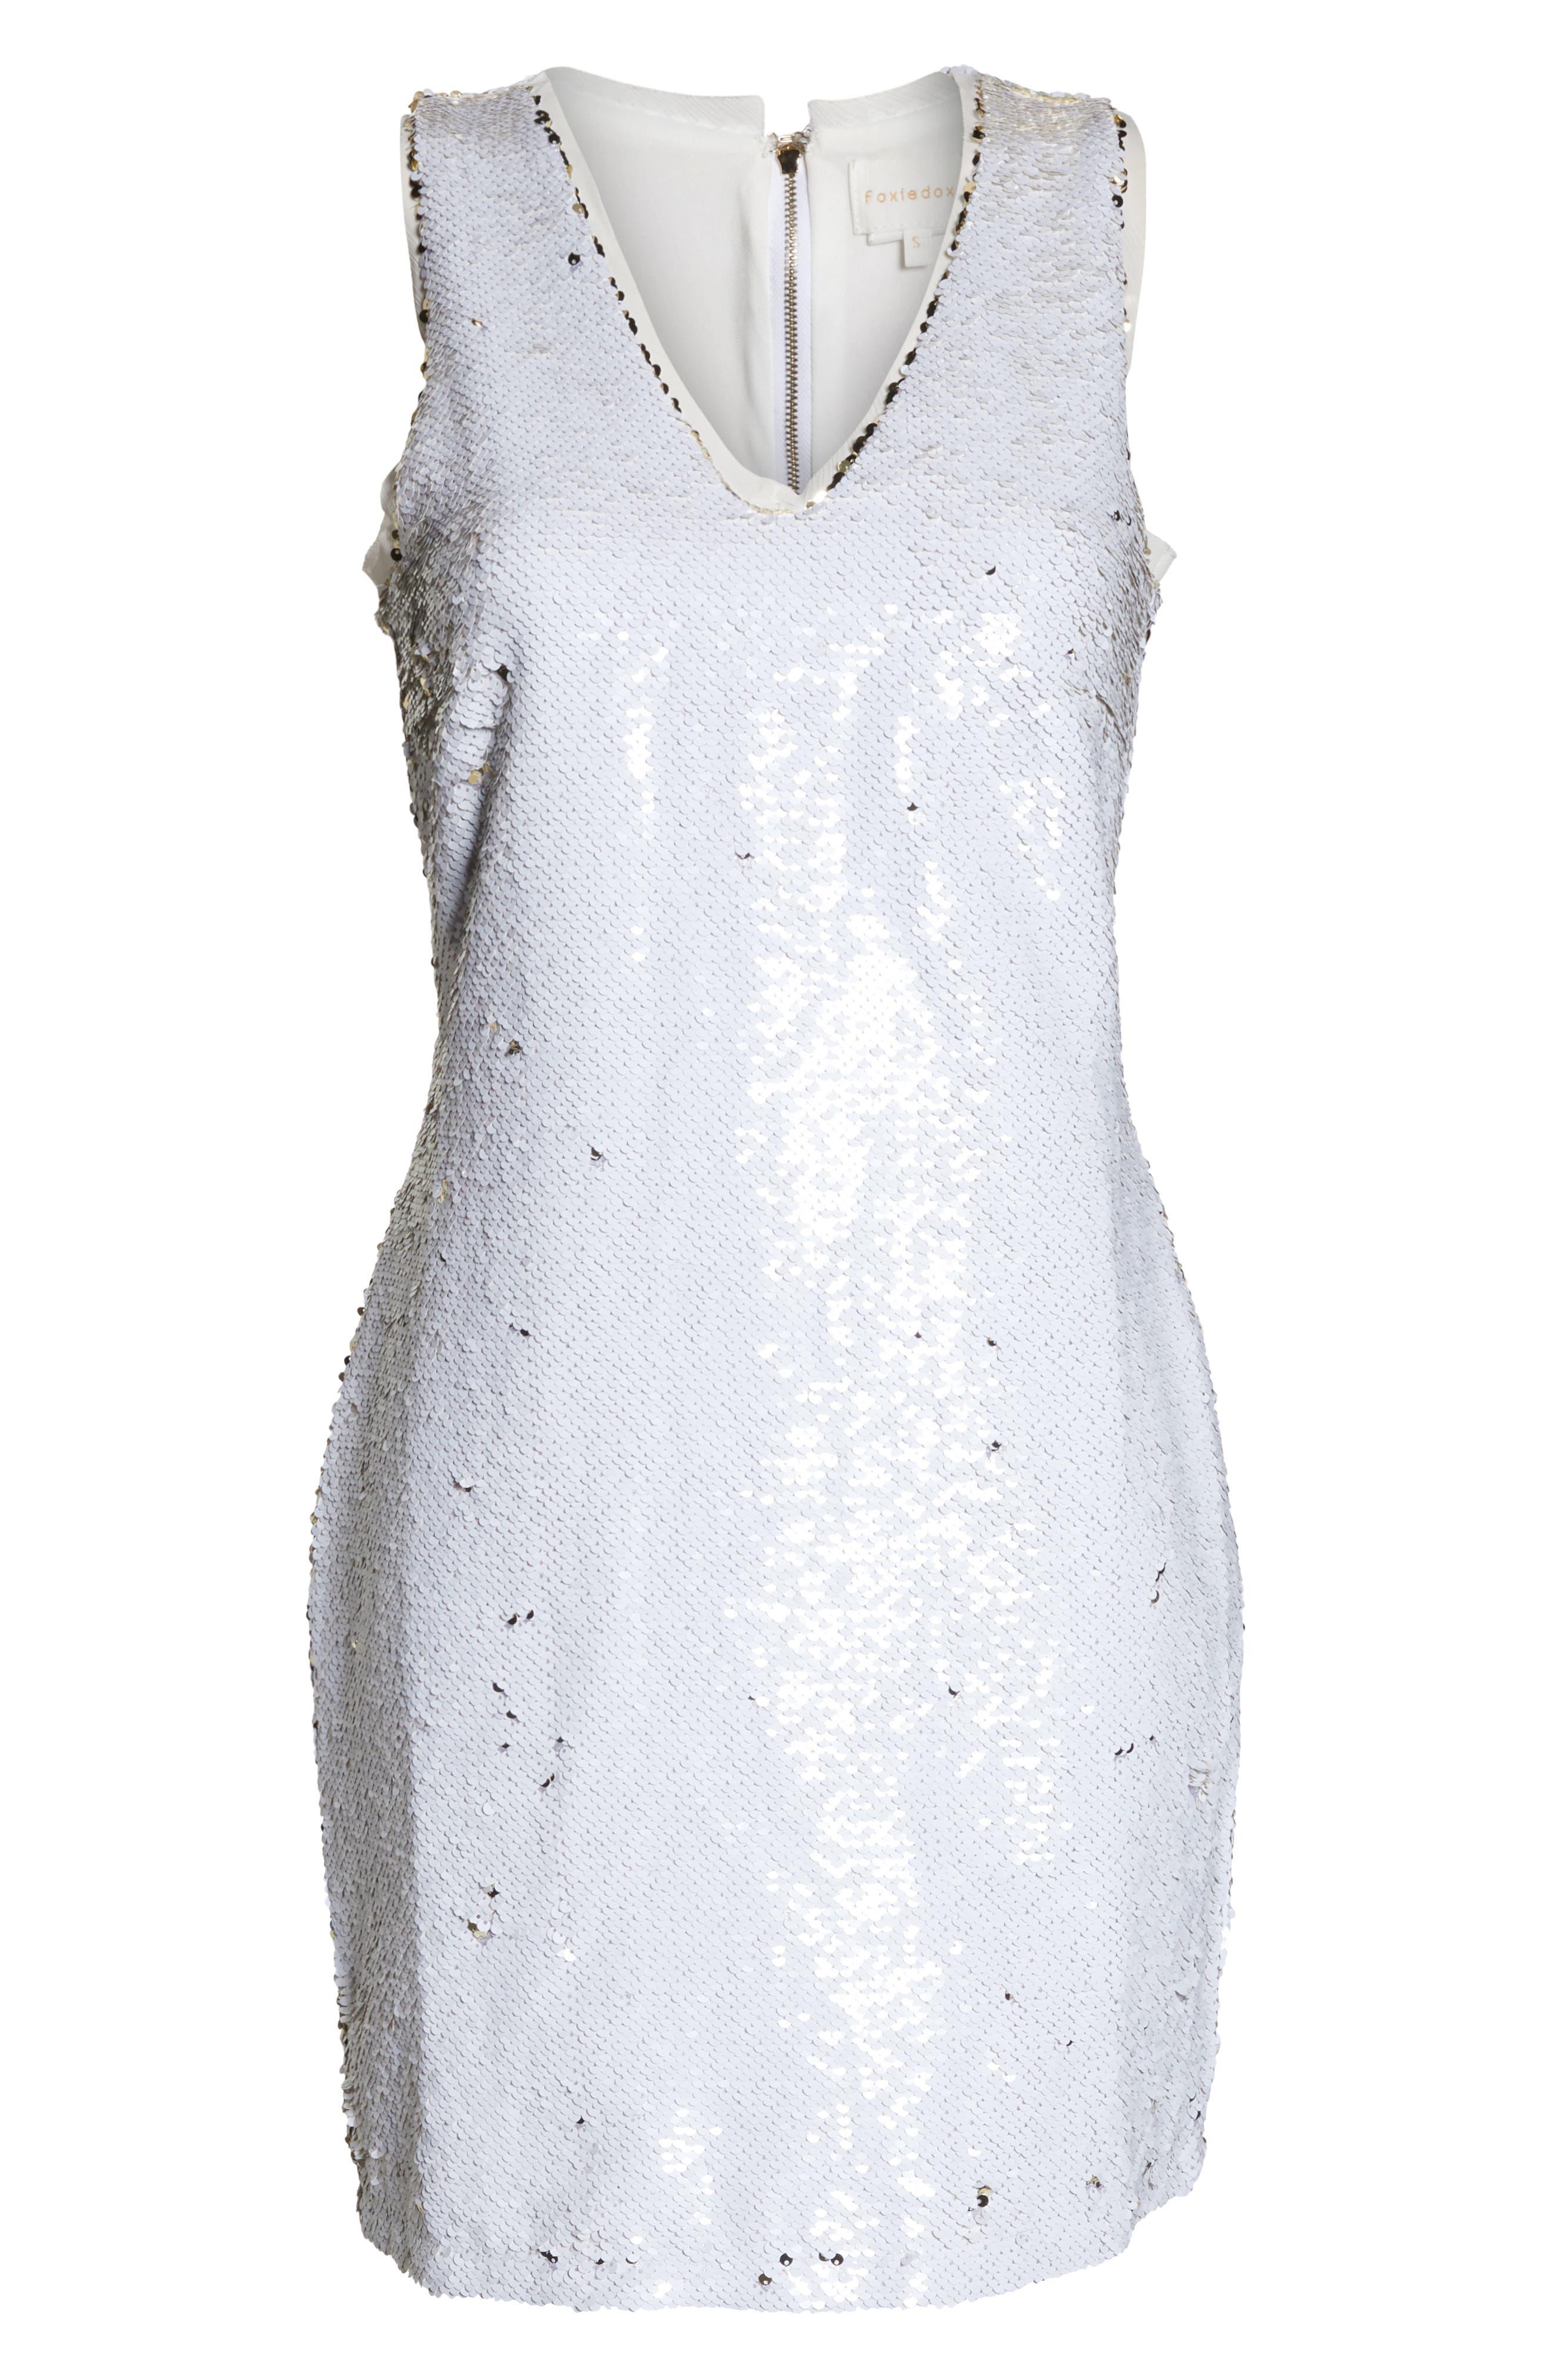 Double Sided Sequin Dress,                             Alternate thumbnail 8, color,                             WHITE MULTI